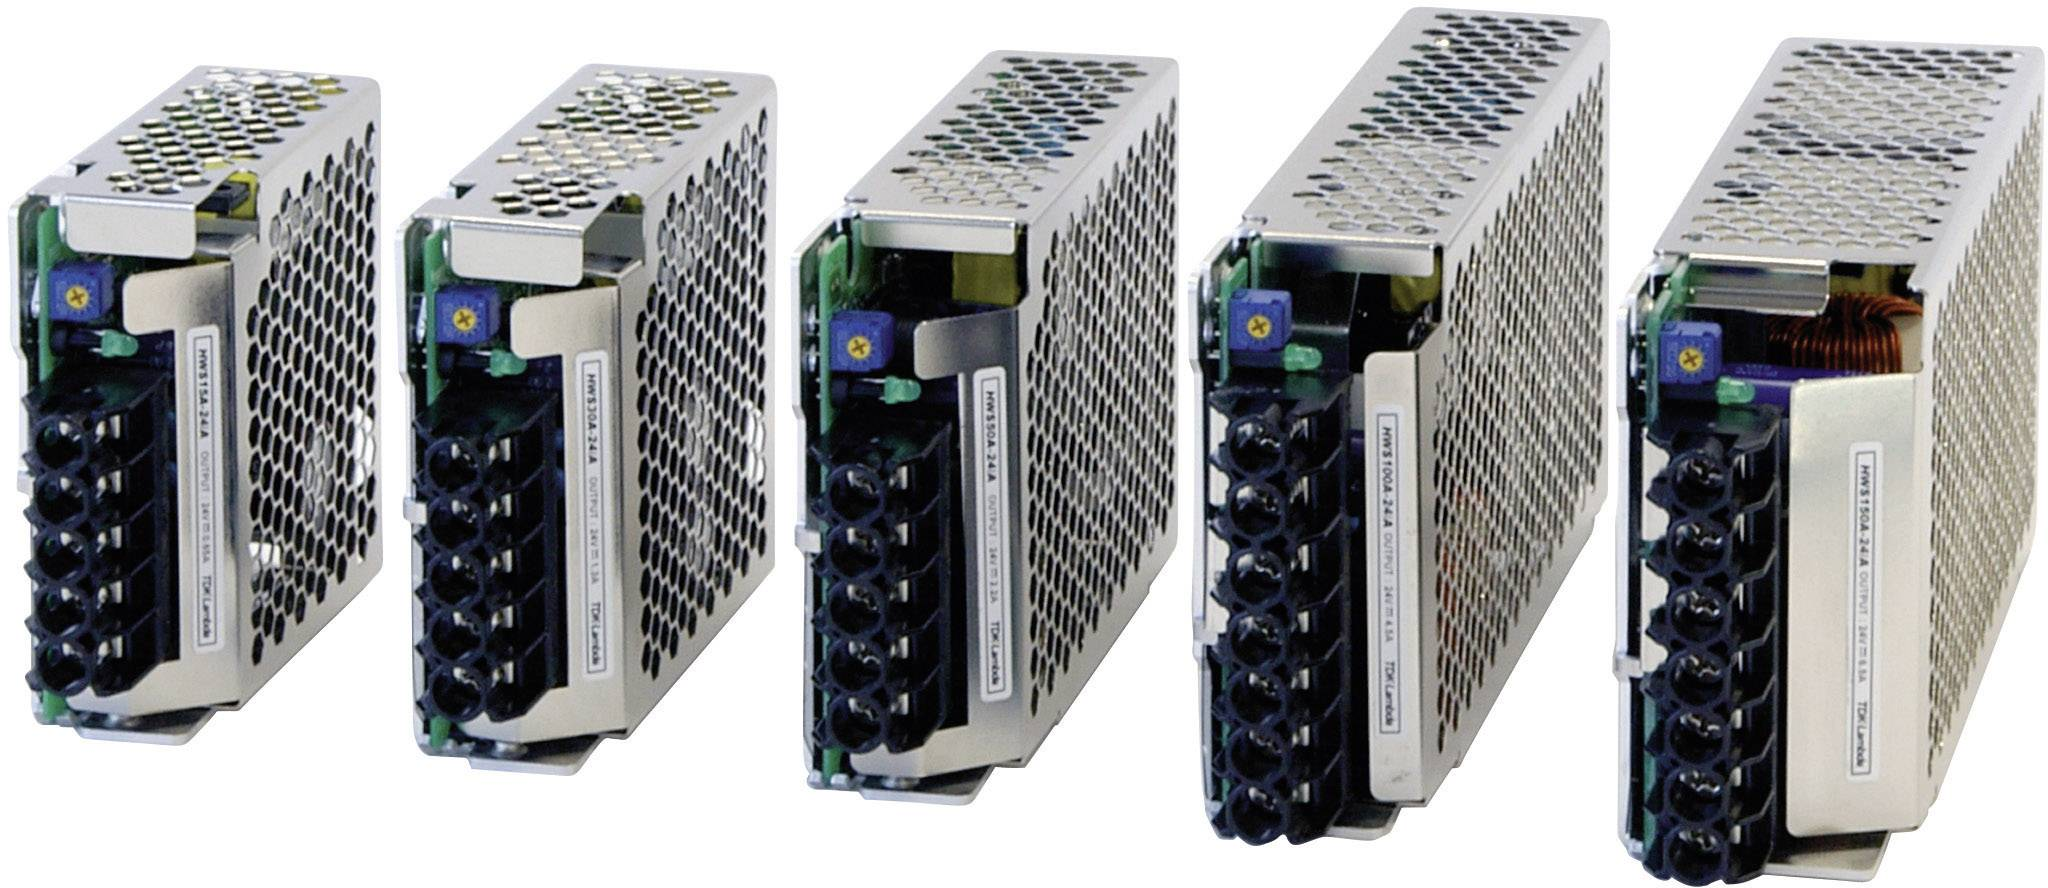 Zabudovateľný napájací zdroj TDK-Lambda HWS-15A-12/A, 12 V, 15,6 W